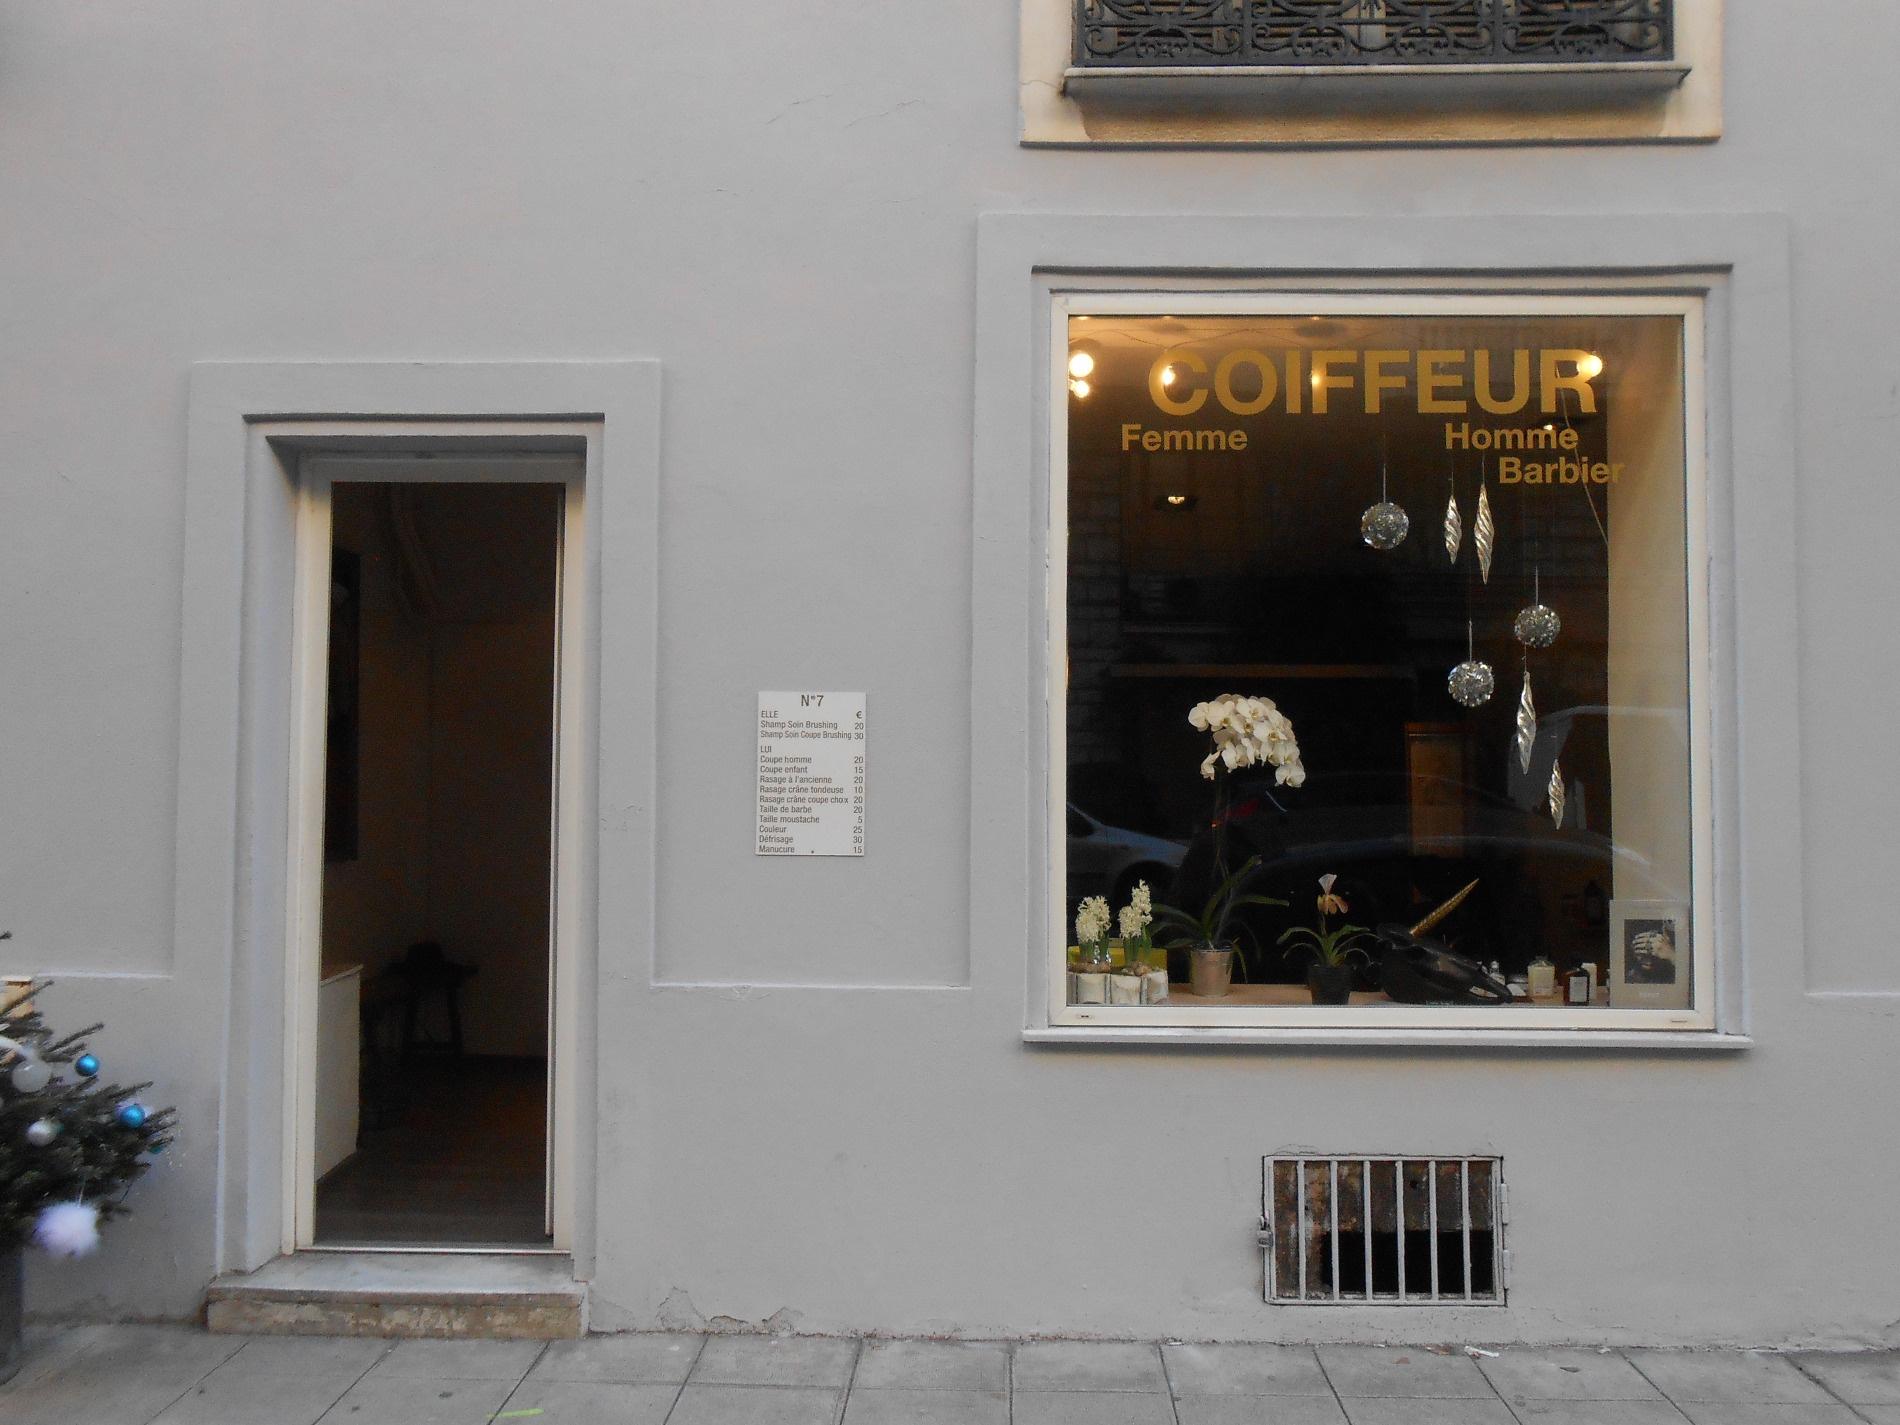 Location commerce salon de coiffure nice rue rossini for Local a louer pour salon de coiffure